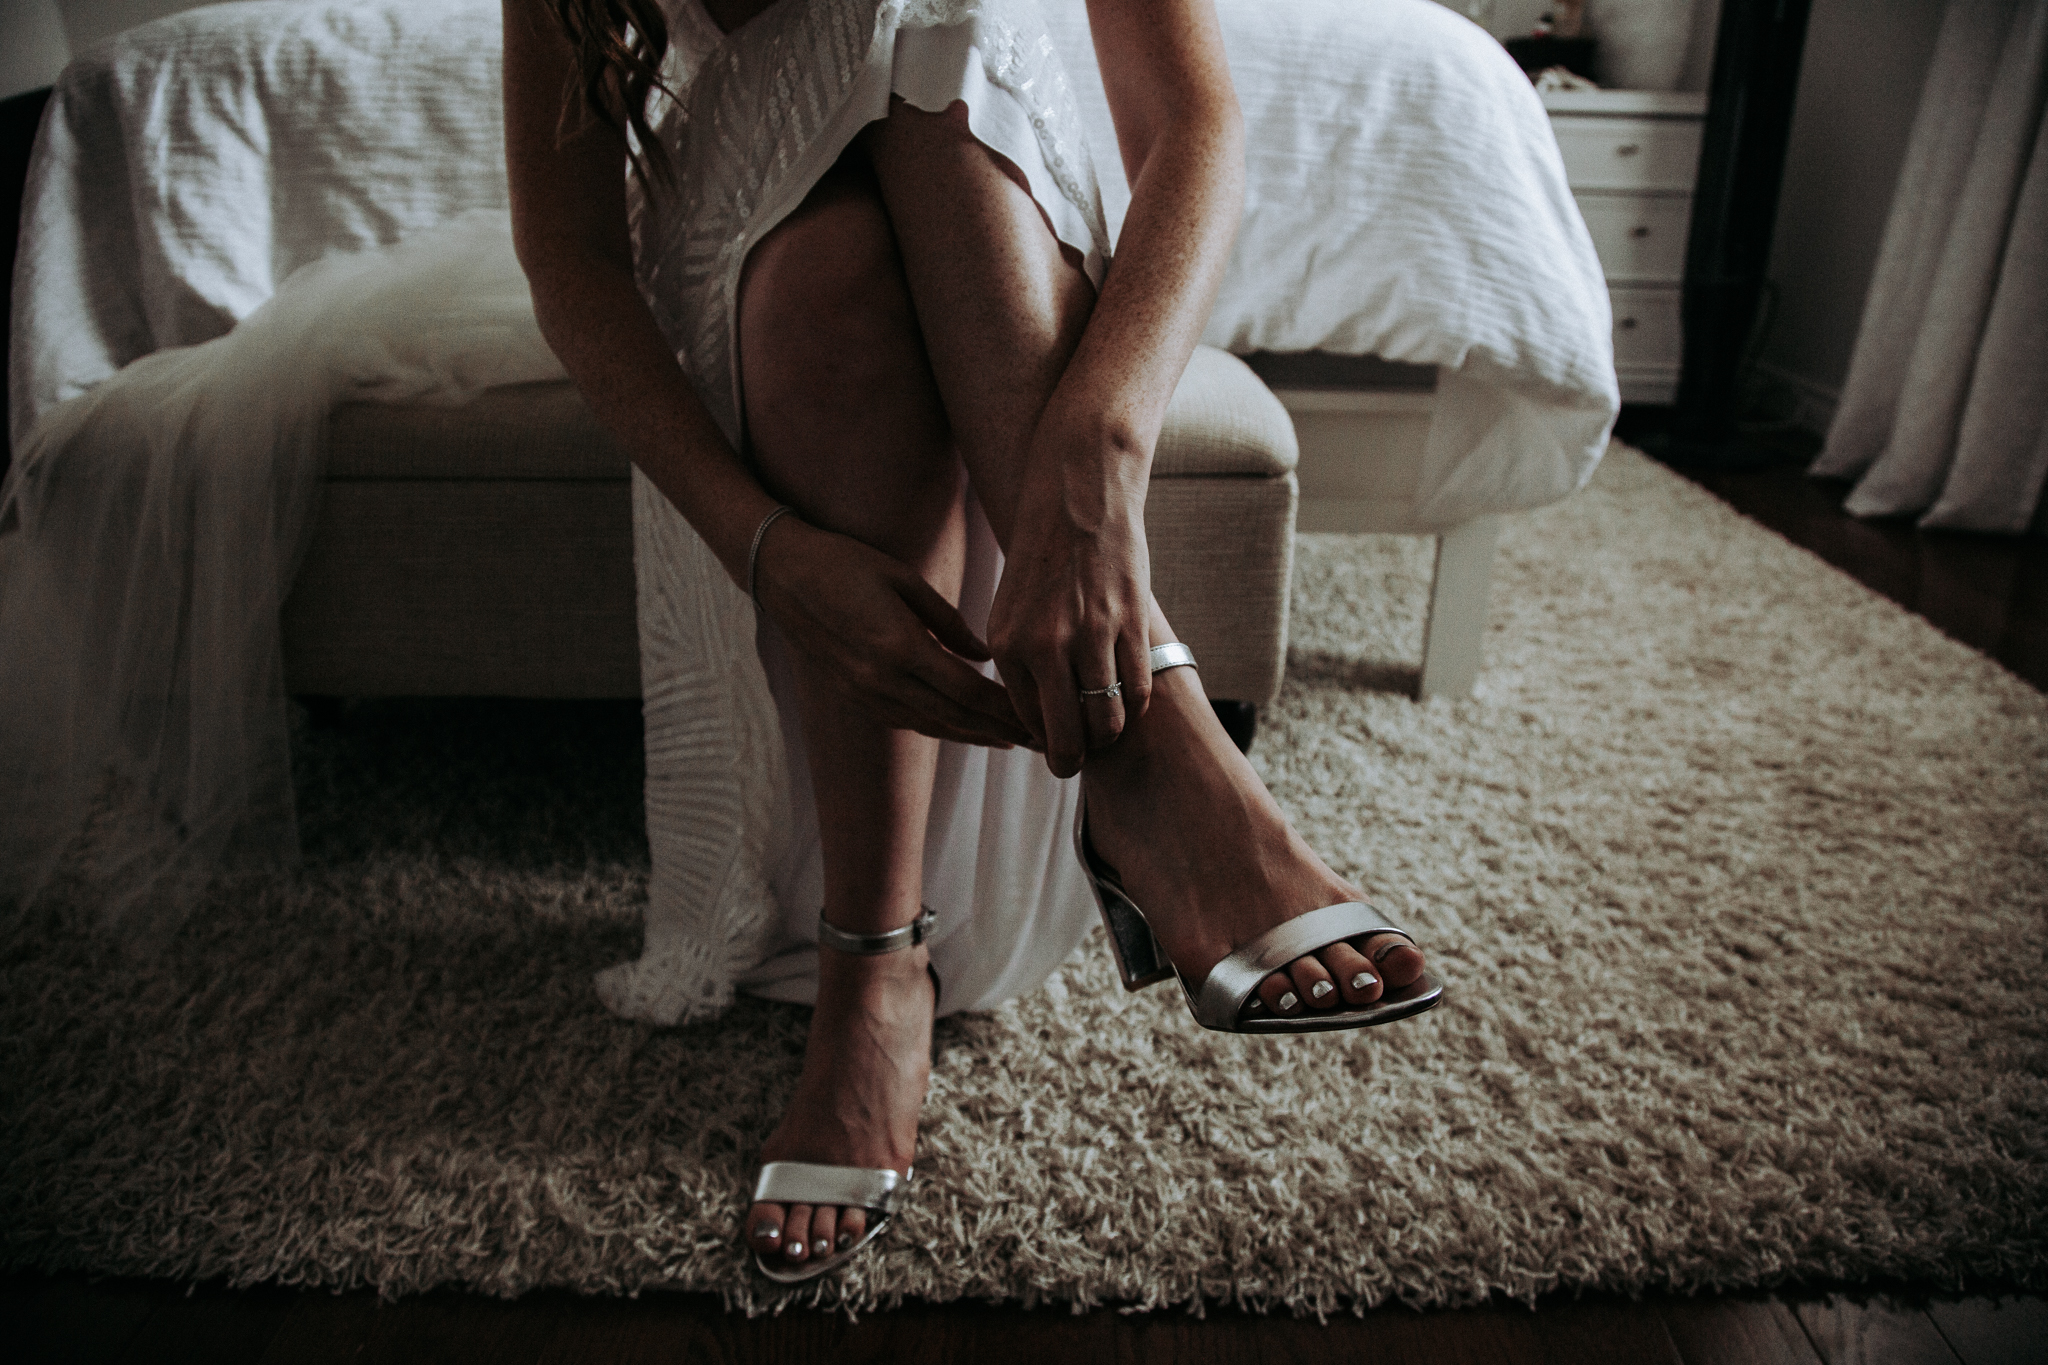 Gillian&carlo-9547.jpg